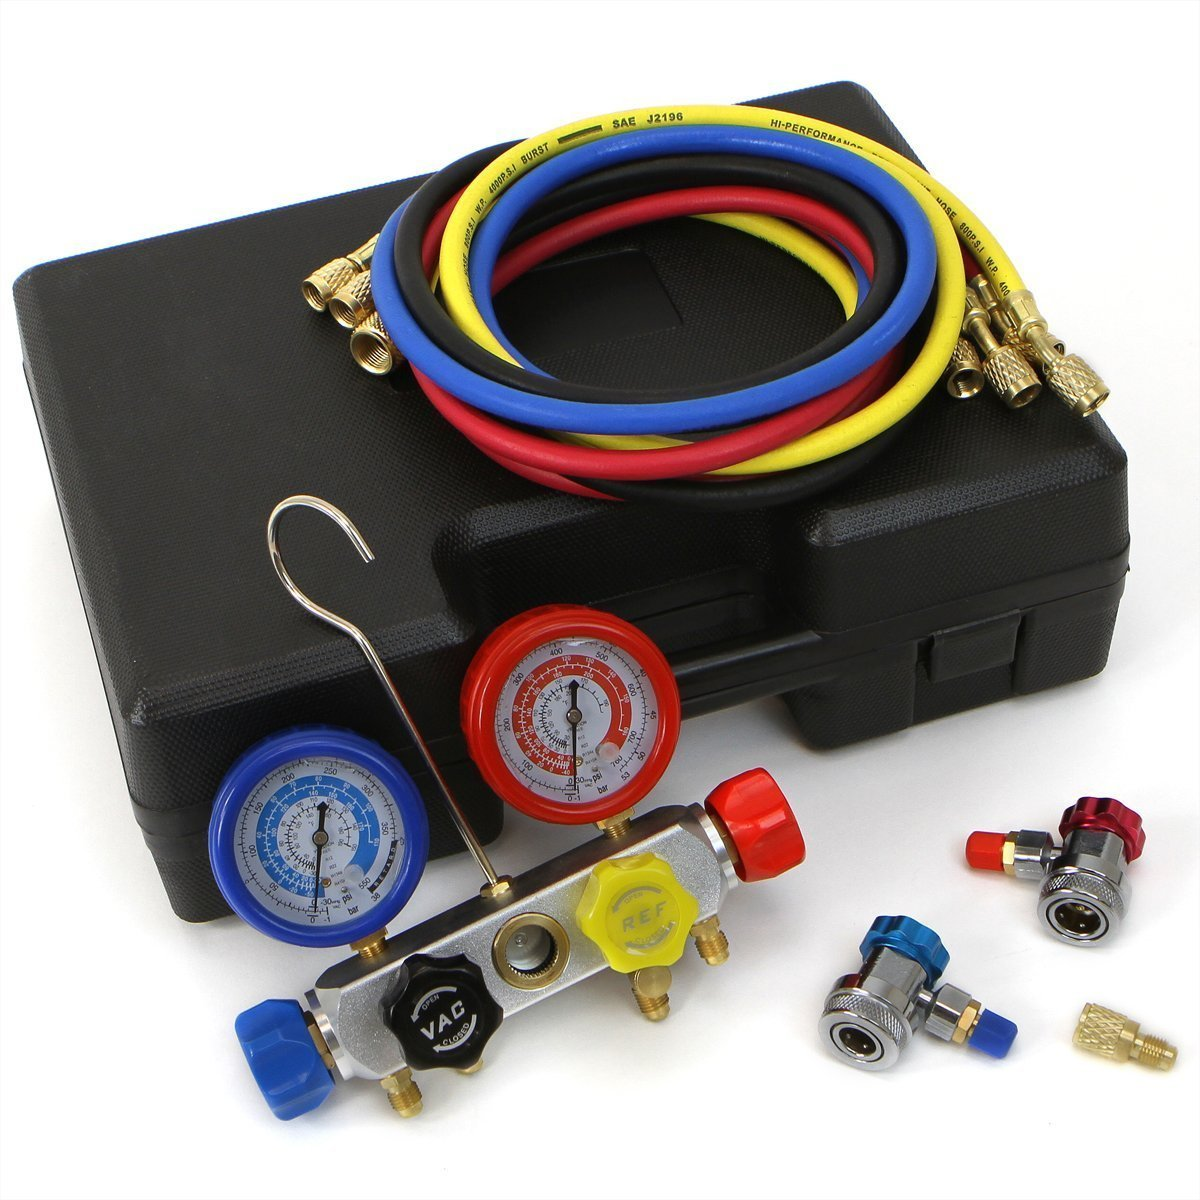 Goetland Copper 4 Way Diagnostic Manifold Gauge Kit Charging Hoses Coupler Adapters for AC Refrigerant R410a R22 R134a HVAC